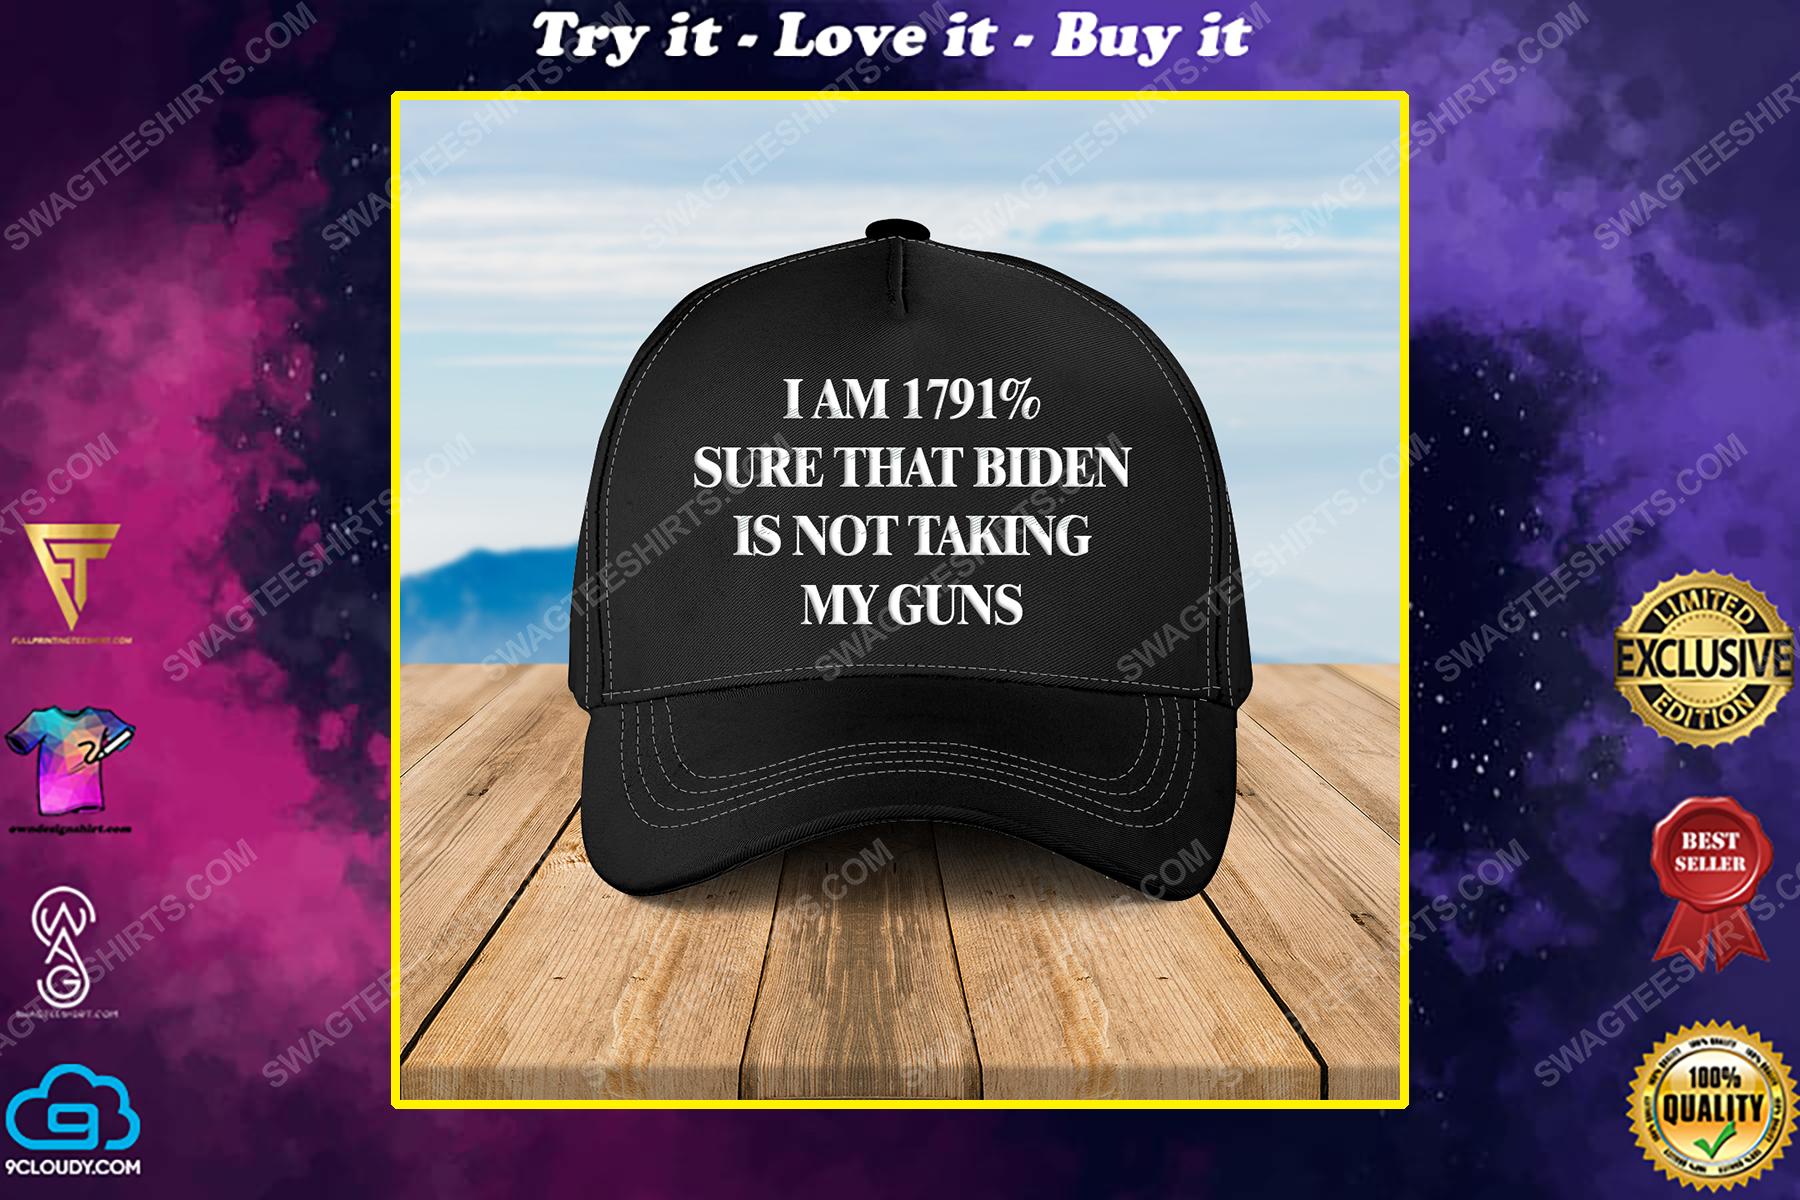 I am 1791 sure that biden is not taking my guns full print classic hat